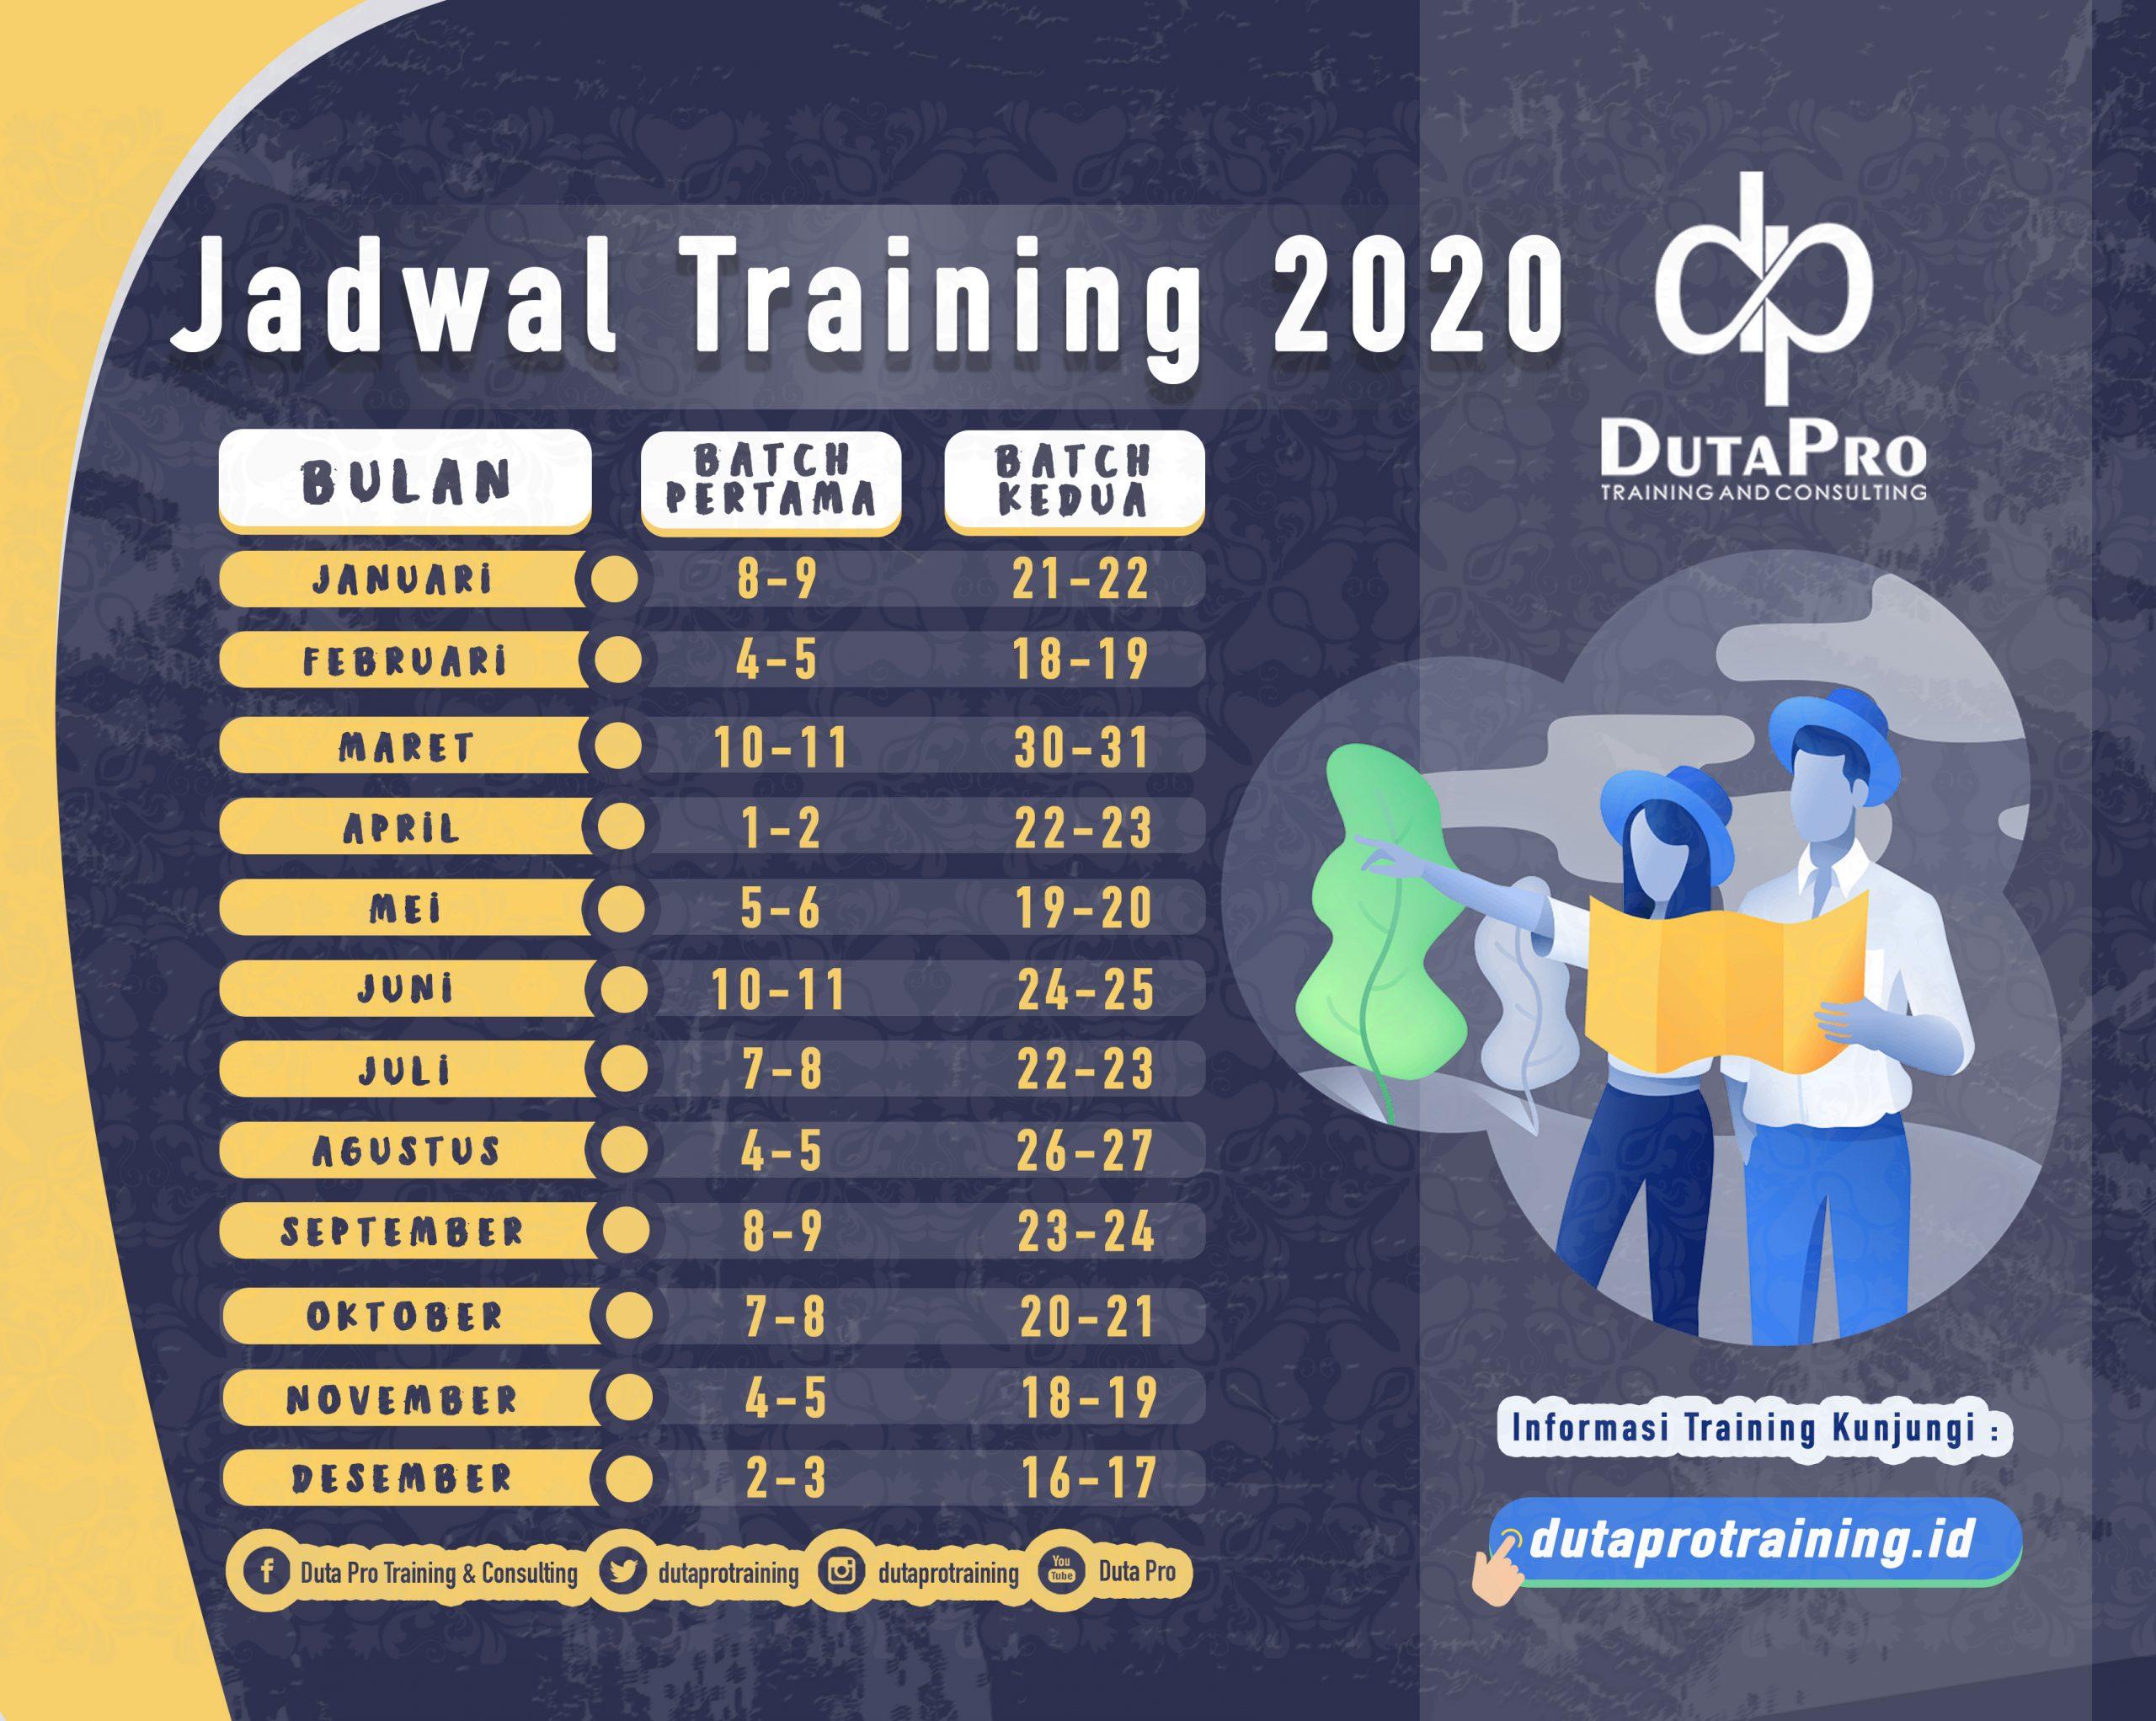 Jadwal Training 2020 Duta Pro